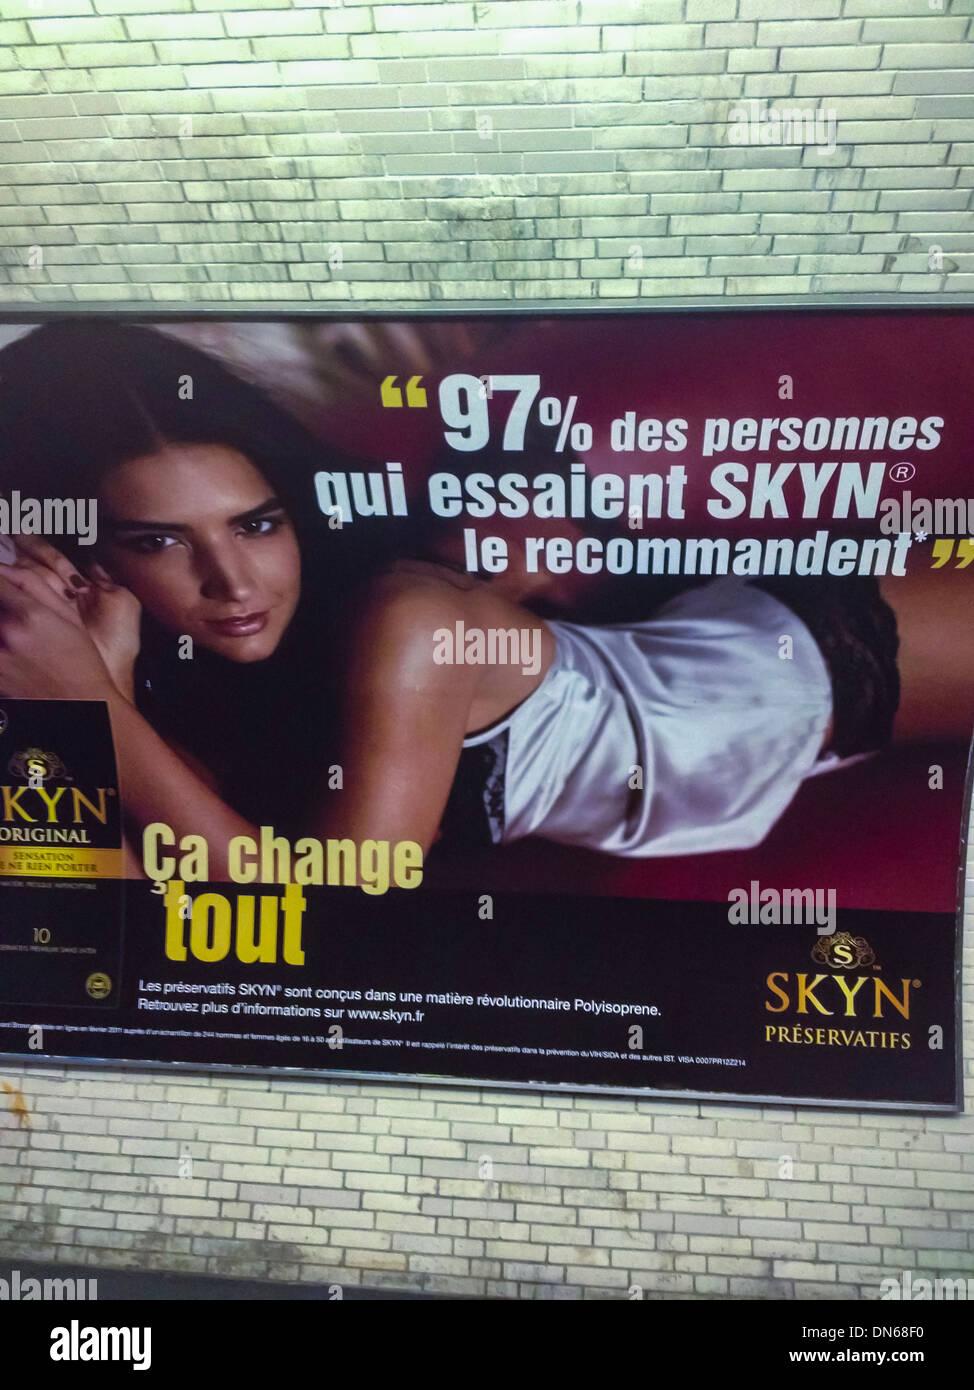 French condom advert - 4 10